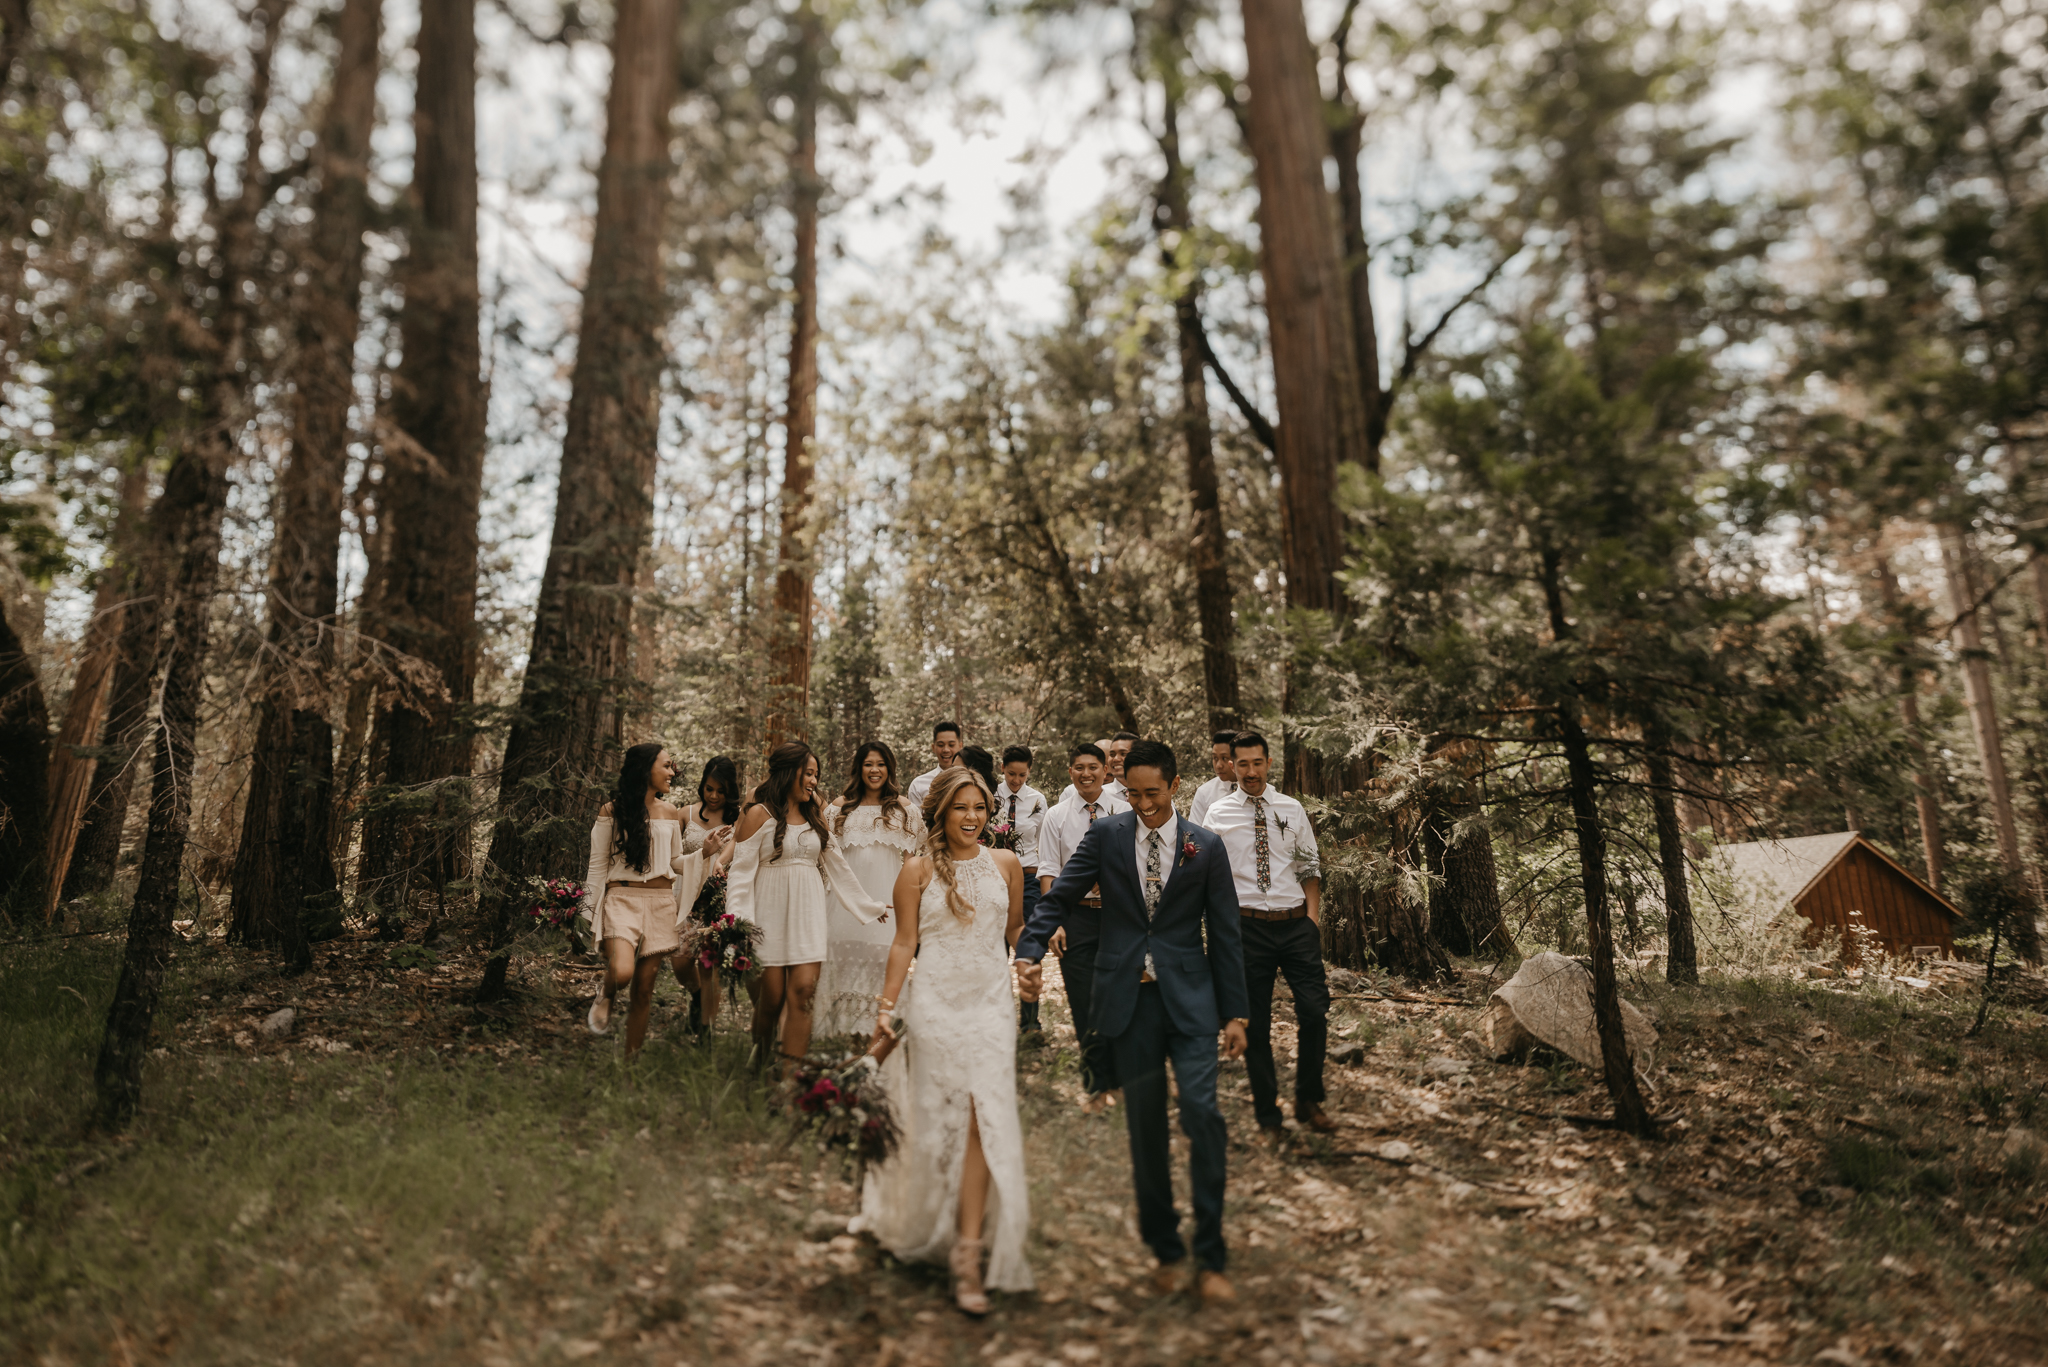 © Isaiah + Taylor Photography - Evergreen Lodge Destination Yoesmite Wedding - Los Angeles Wedding Photographer-094.jpg